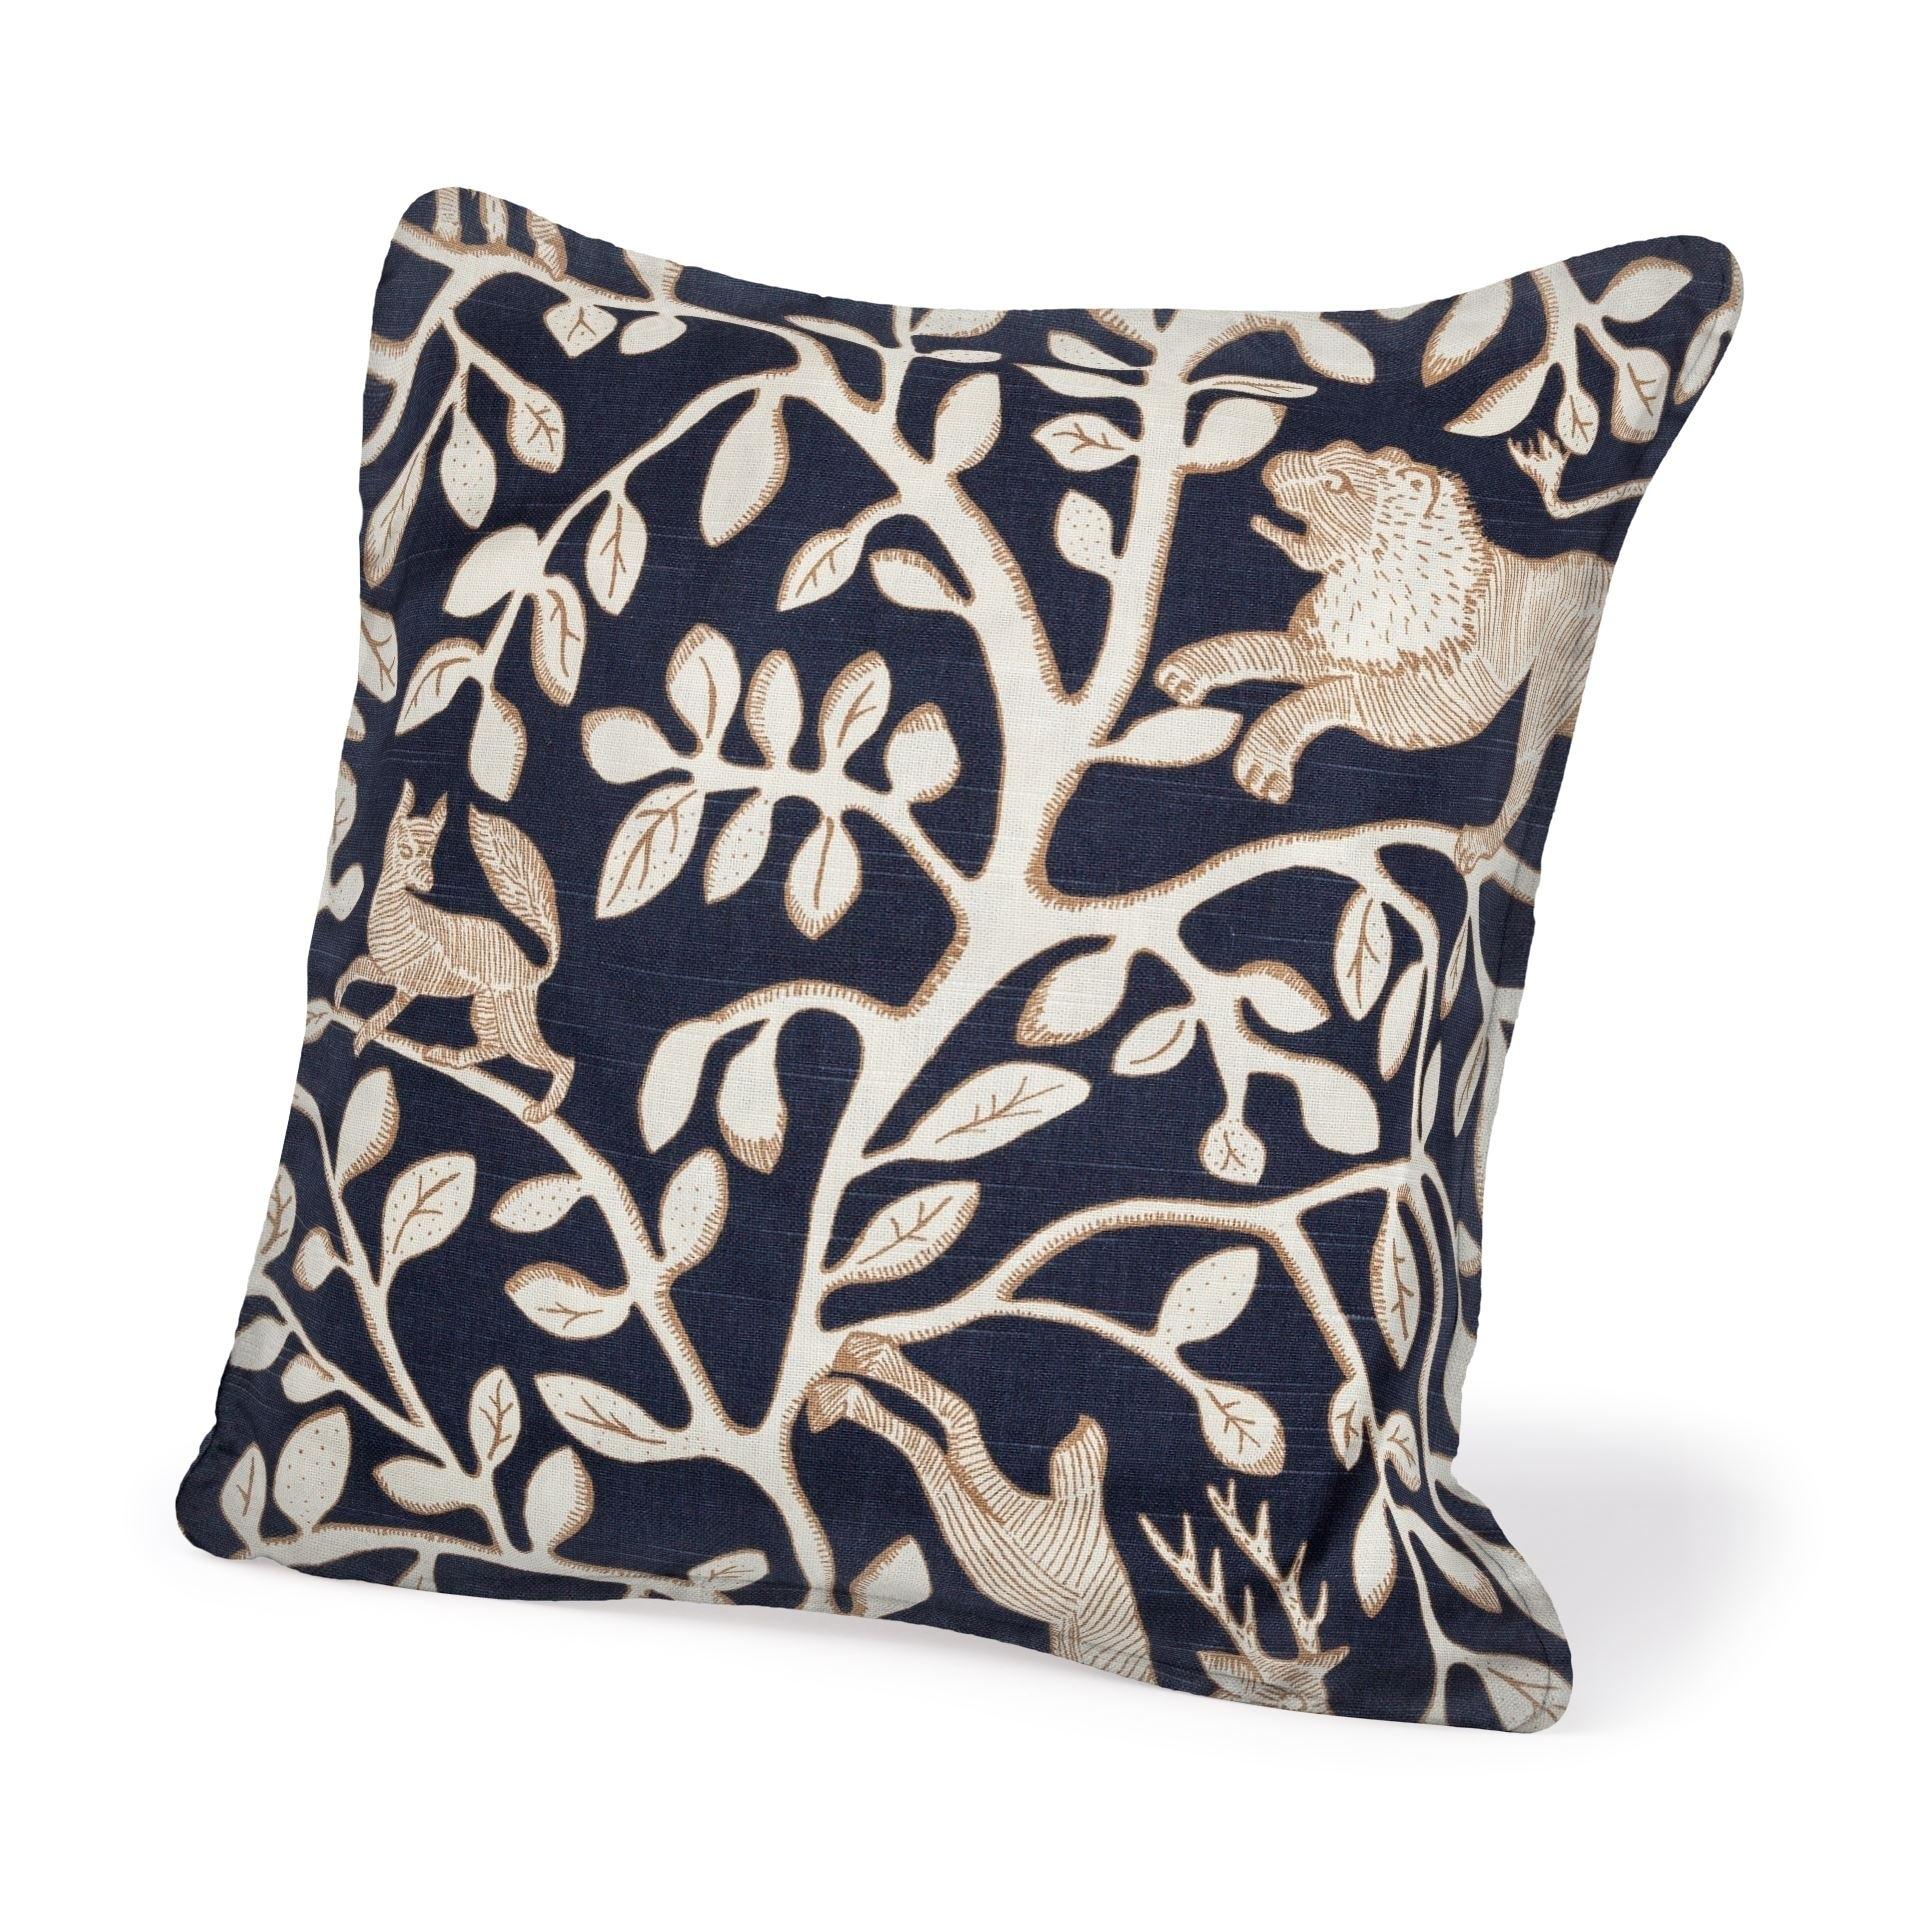 Mercana Calla III 22 x 22 (cover only) Decorative Pillow